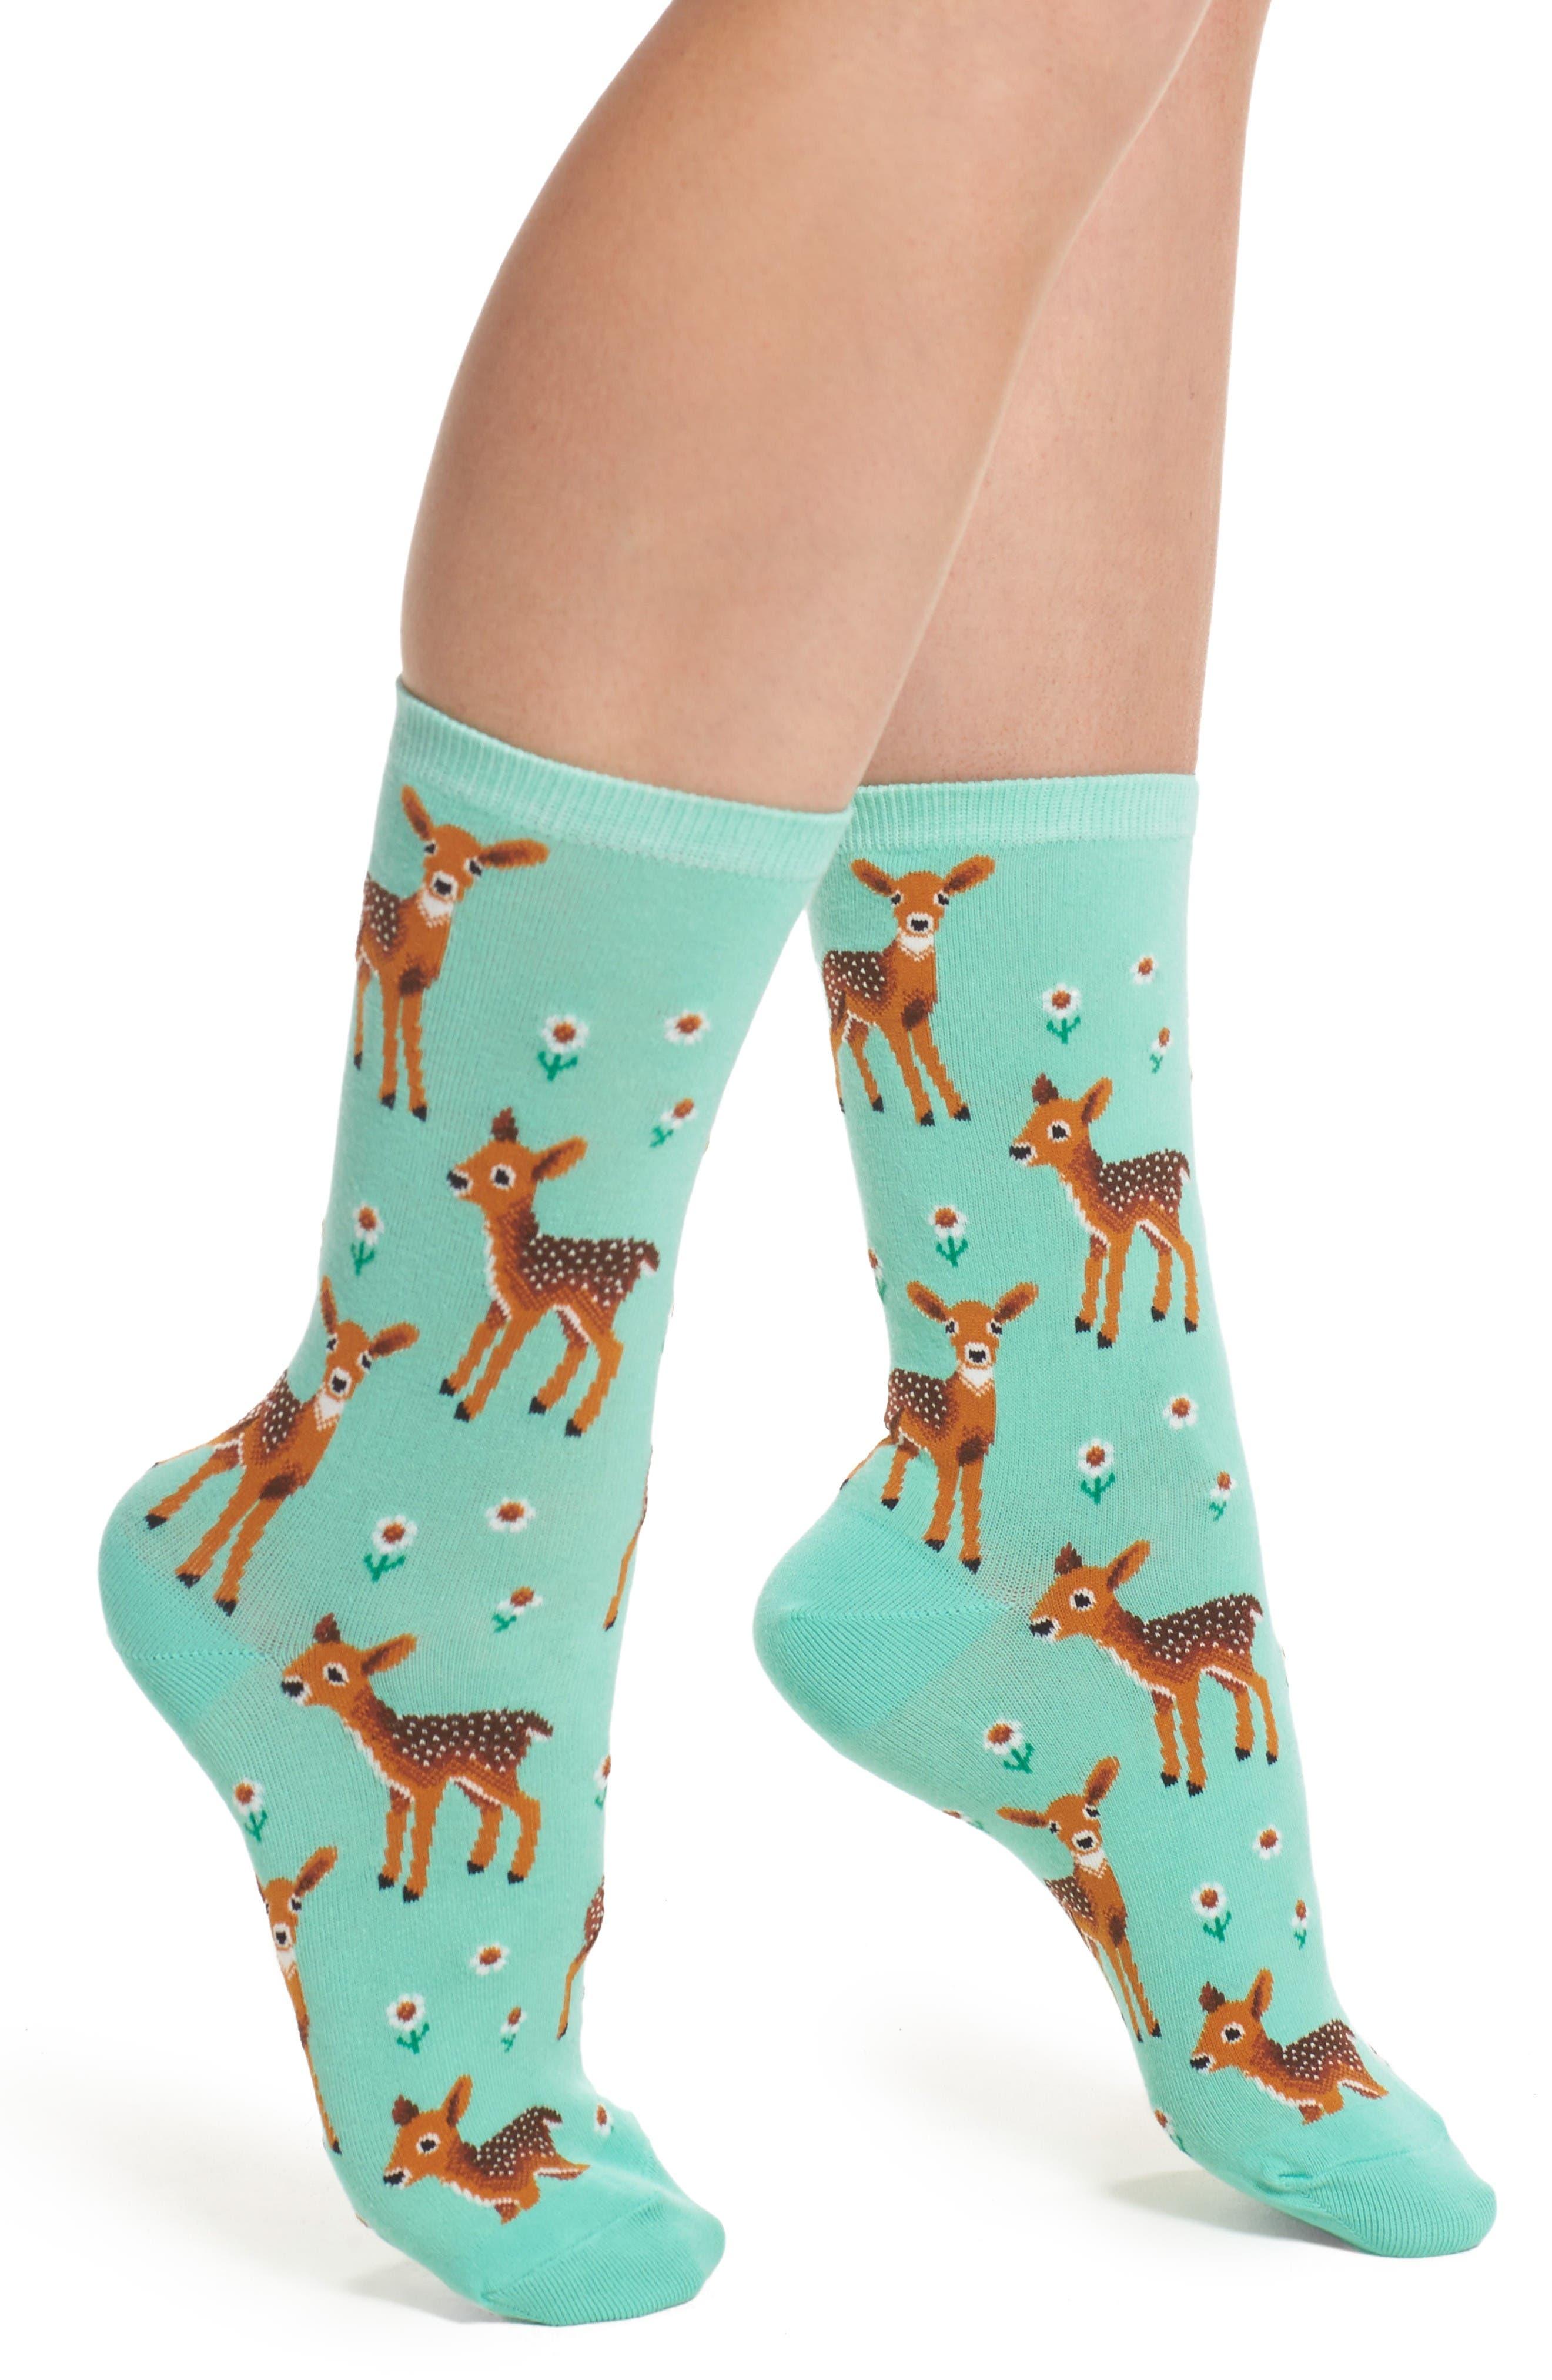 Main Image - Hot Sox Spring Deer Crew Socks (3 for $15)